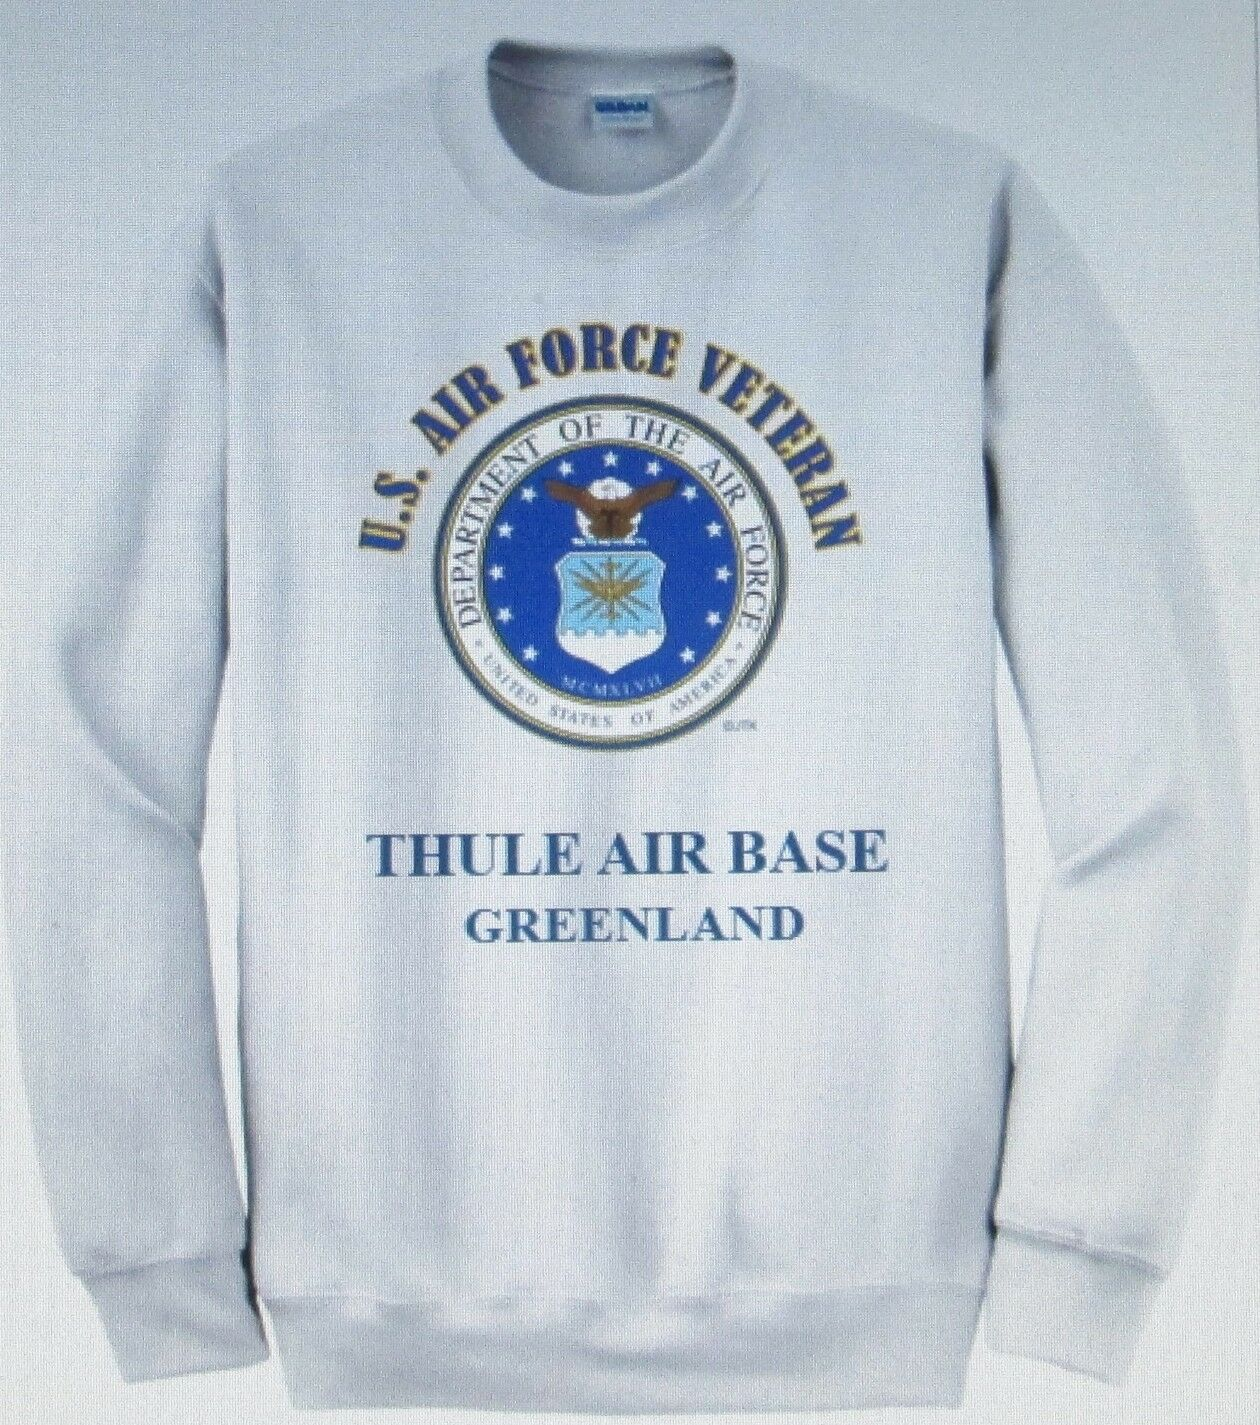 bb1a0f47772 THULE AIR BASE AIR FORCE EMBLEM VETERAN SWEATSHIRT GREENLAND ...